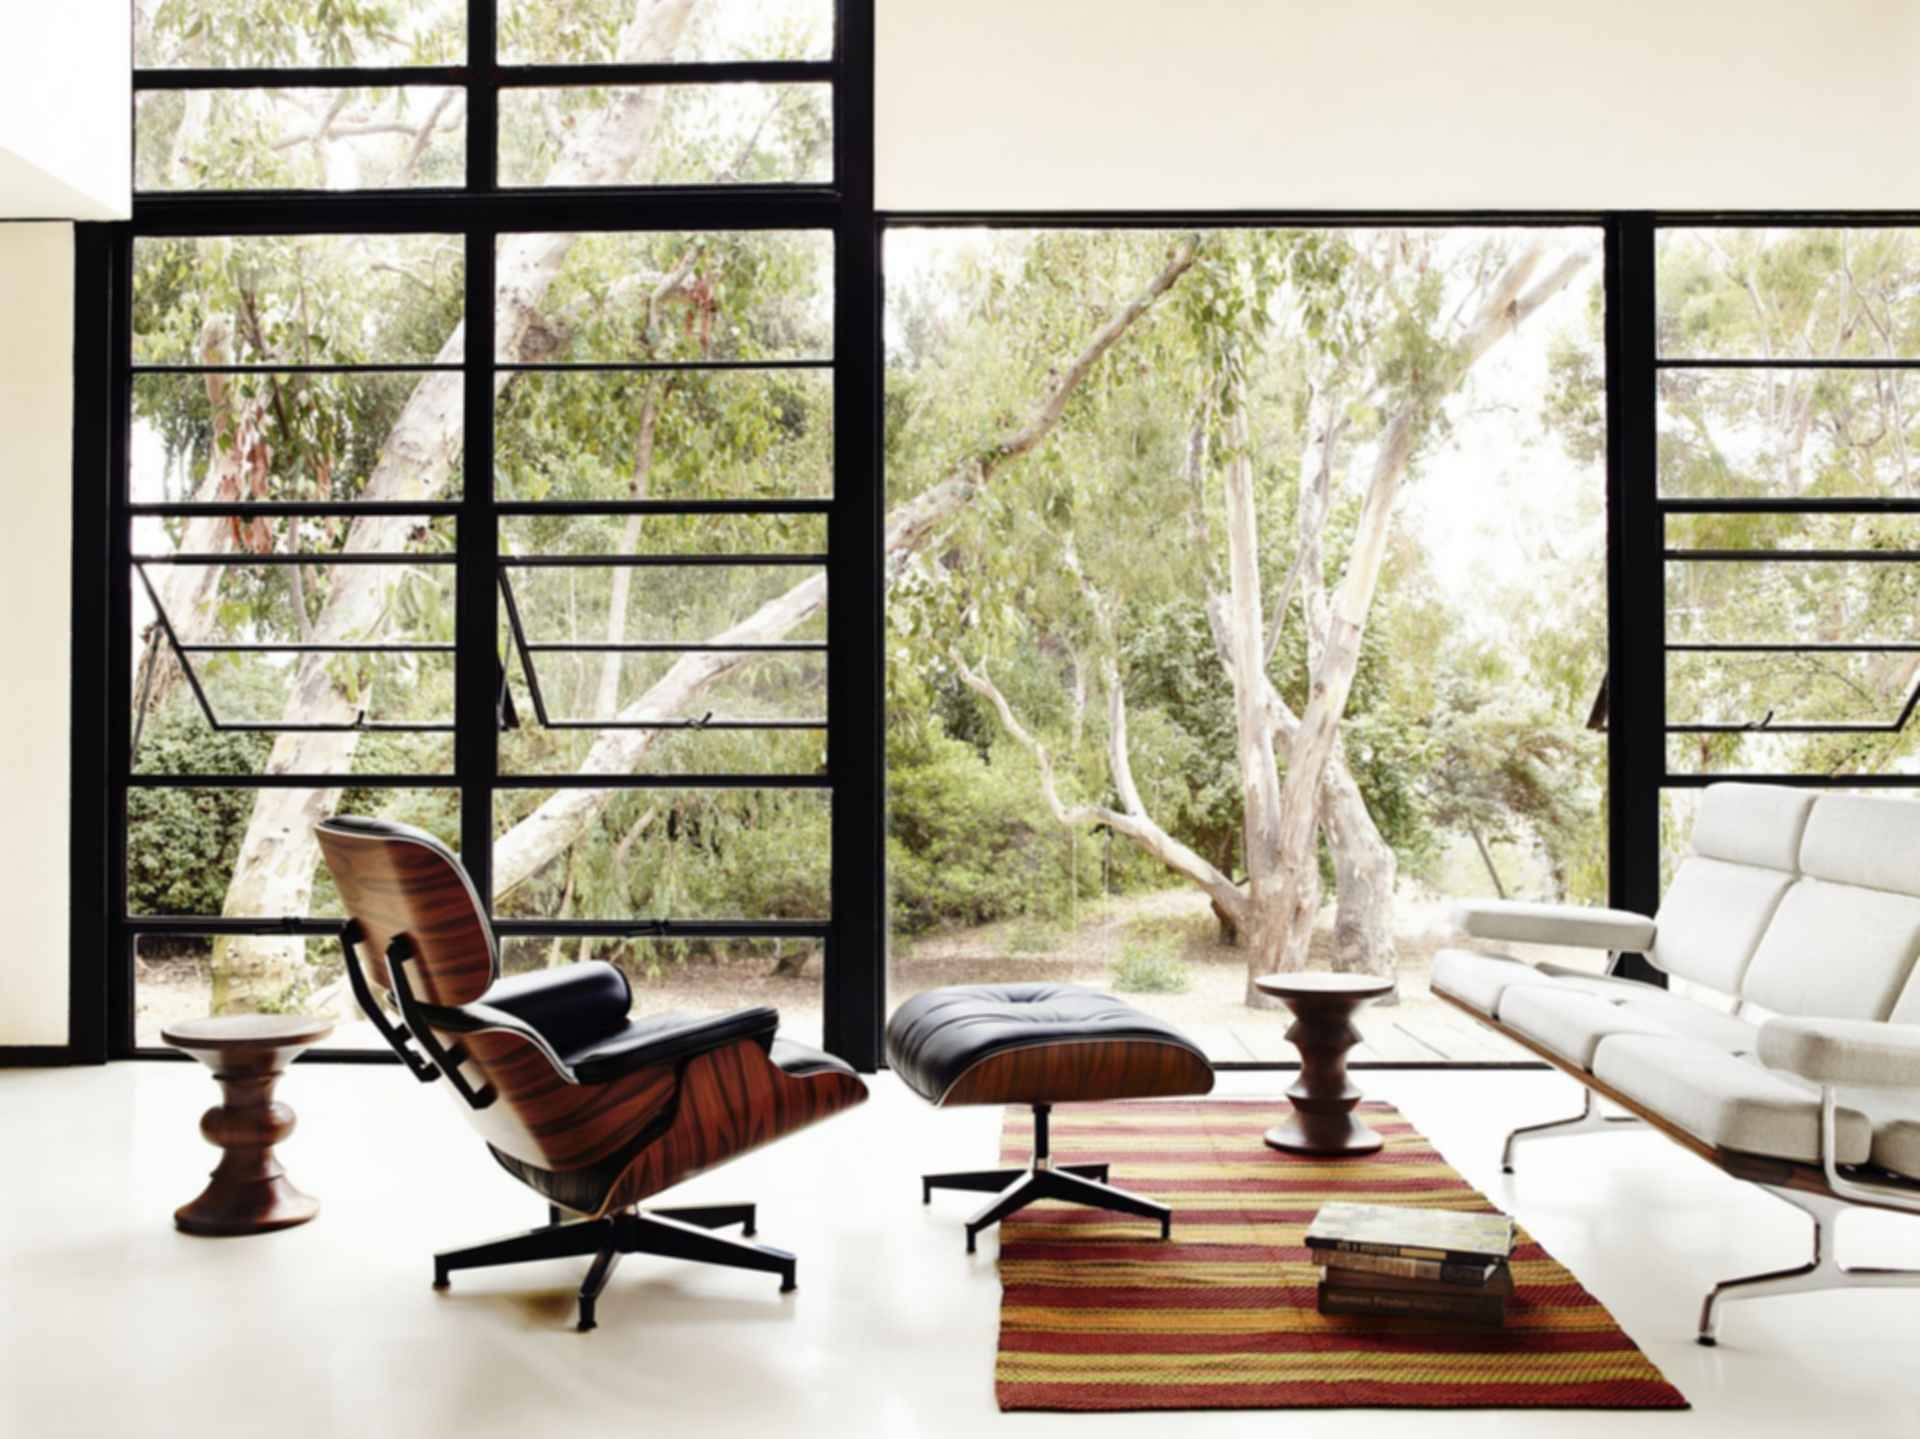 Eames House - Exterior/Walkway